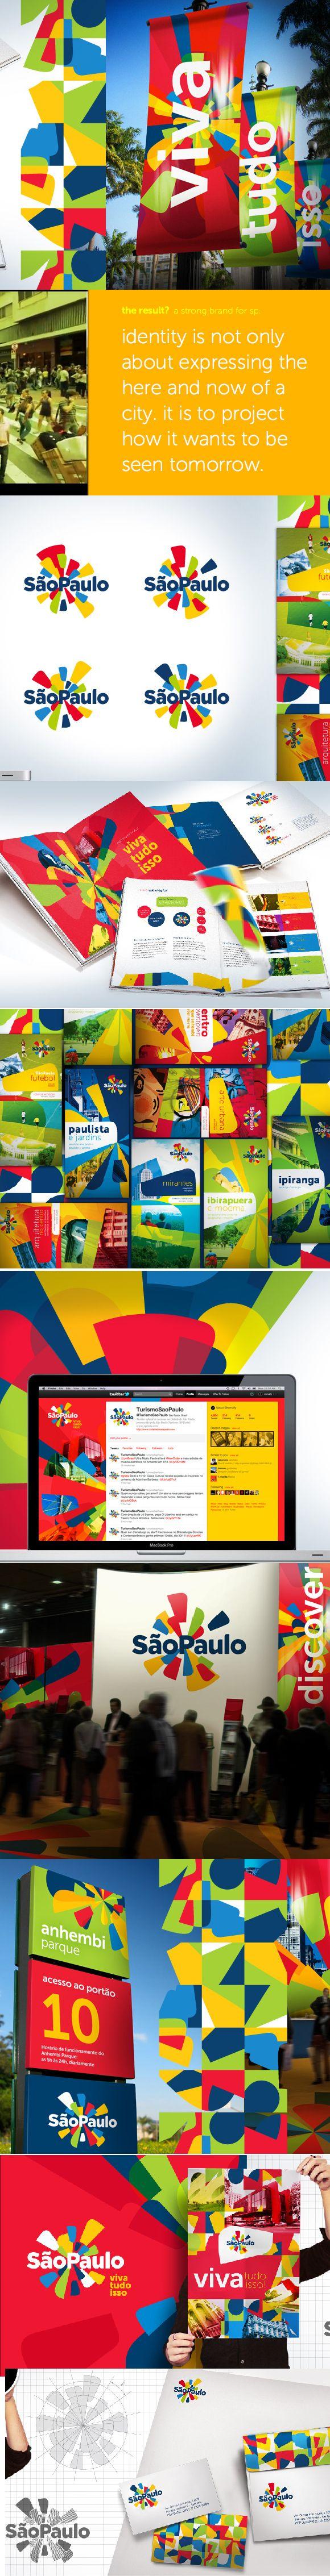 Viva tudo Isso - Sao Paulo City Branding - created by Romulocastilho - Ideas that inspire BEN